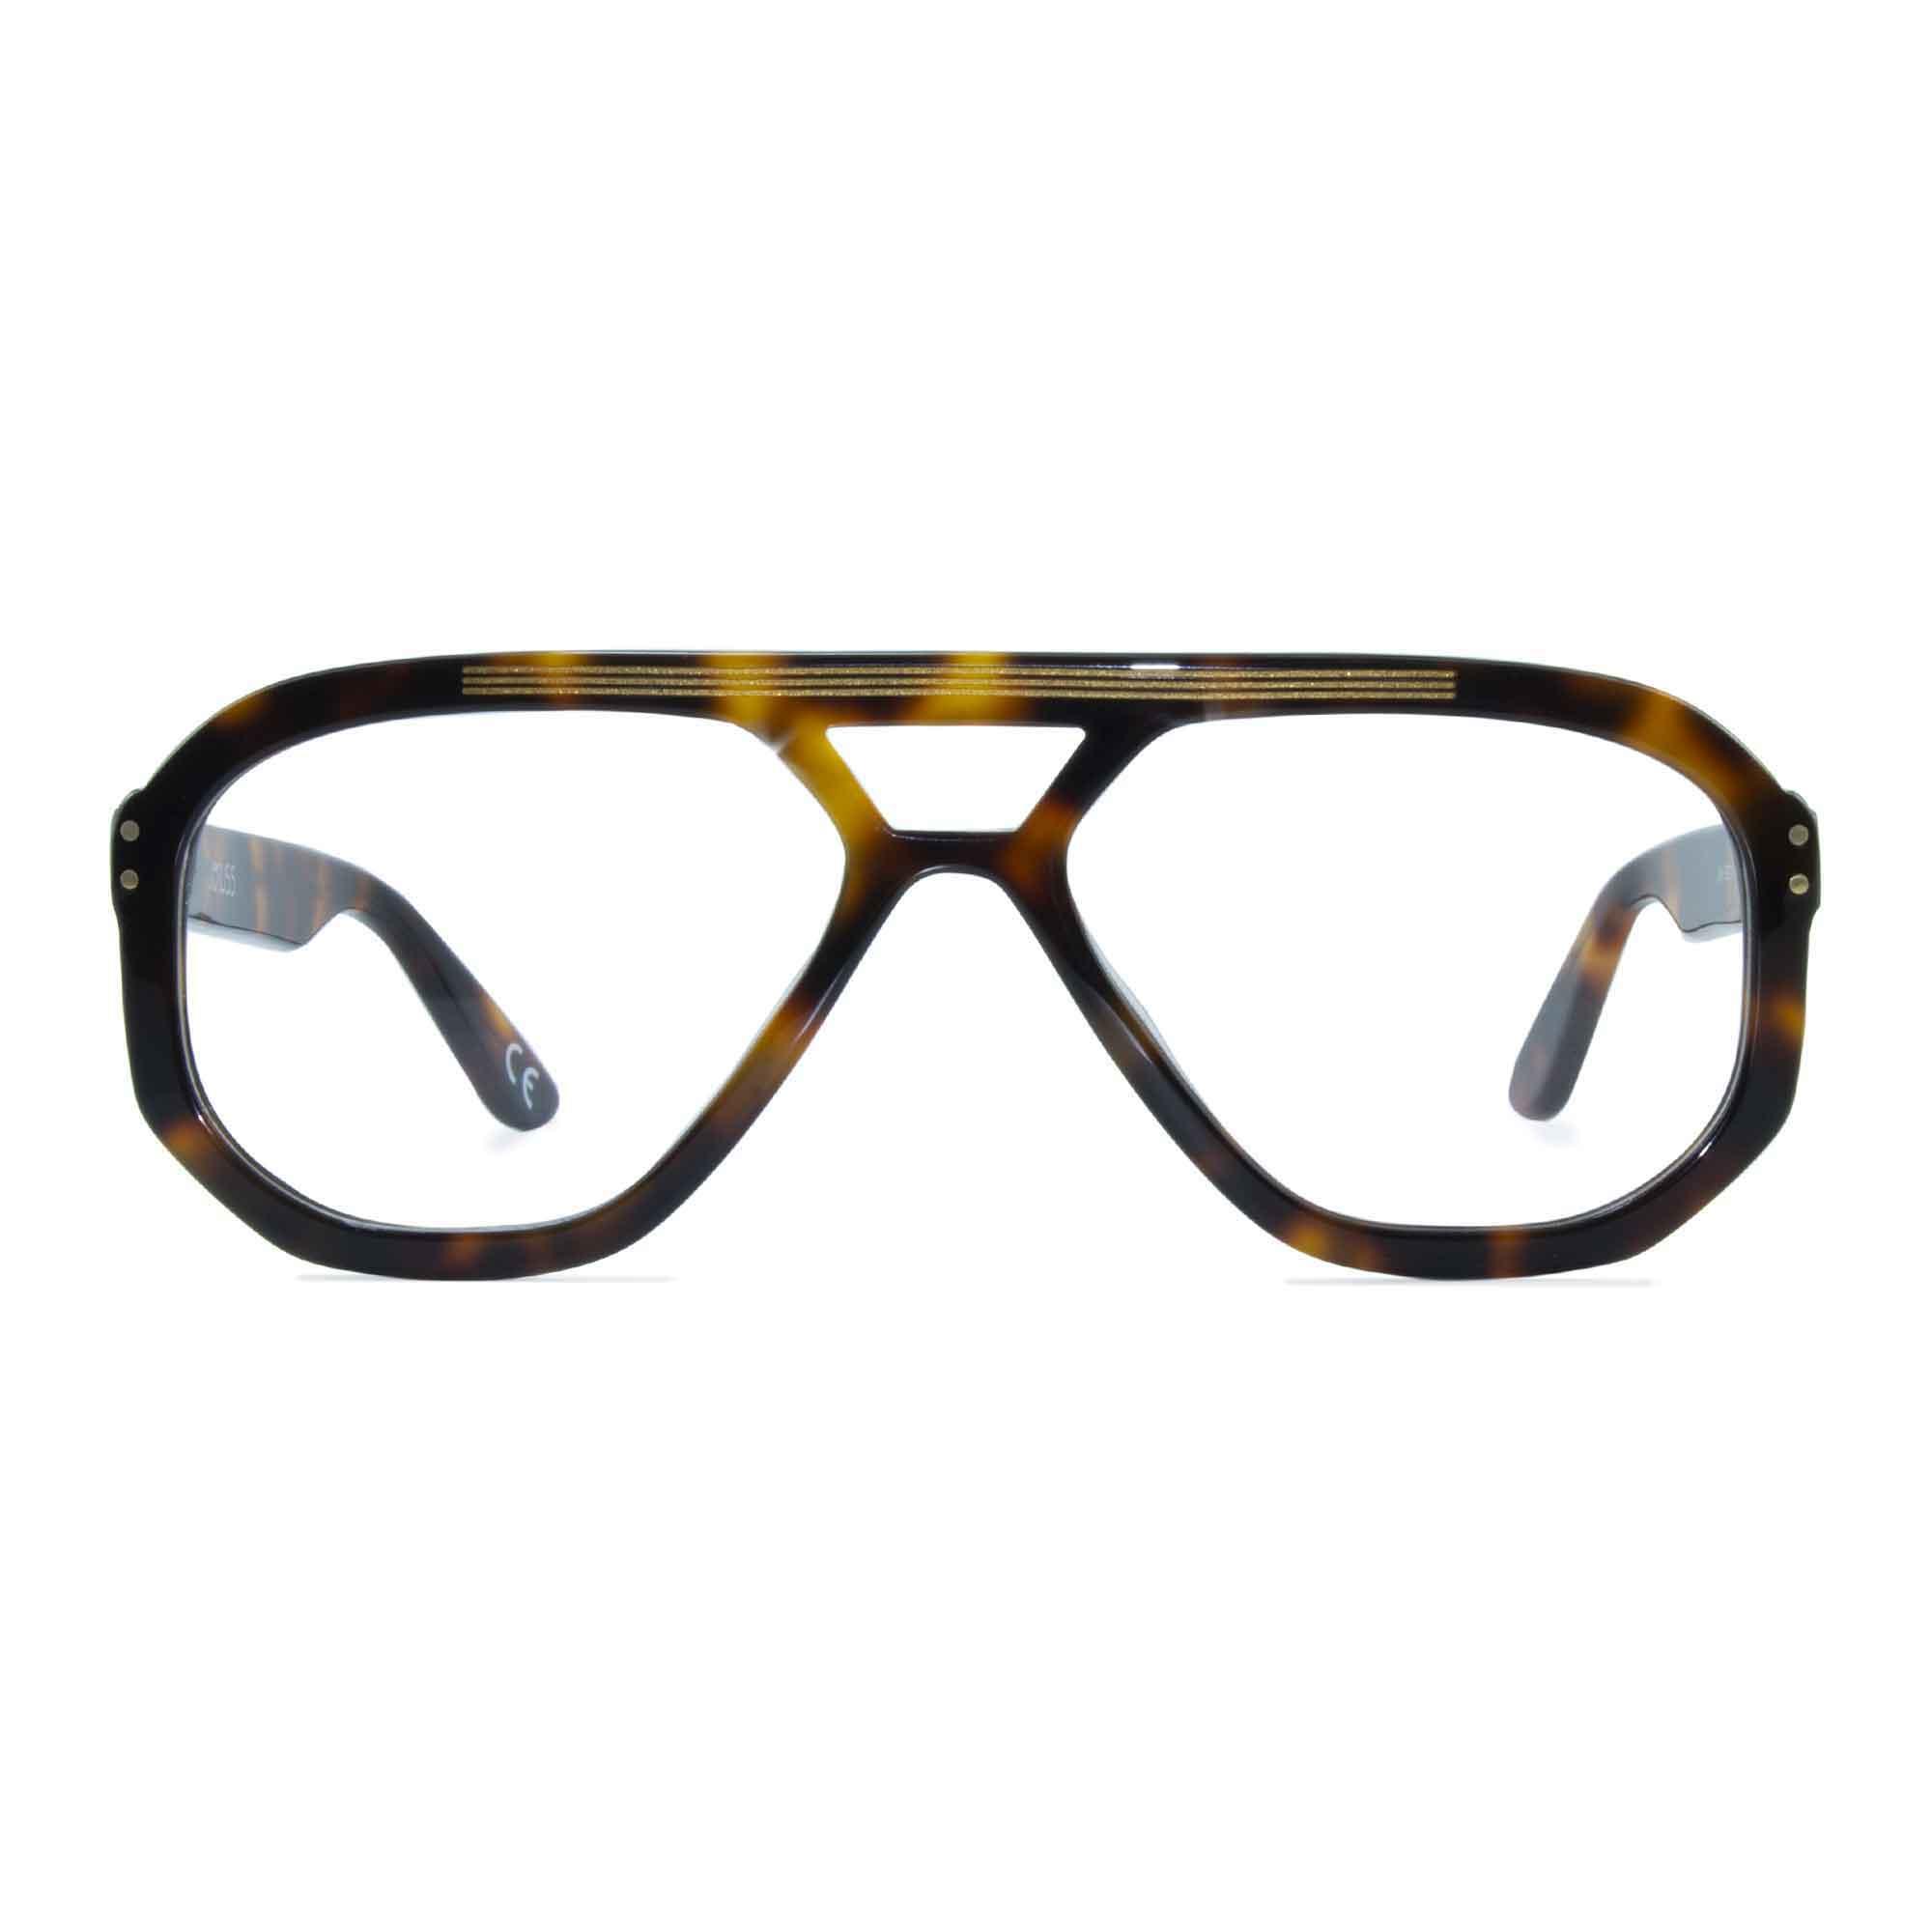 Joiuss jim tortoiseshell navigator glasses